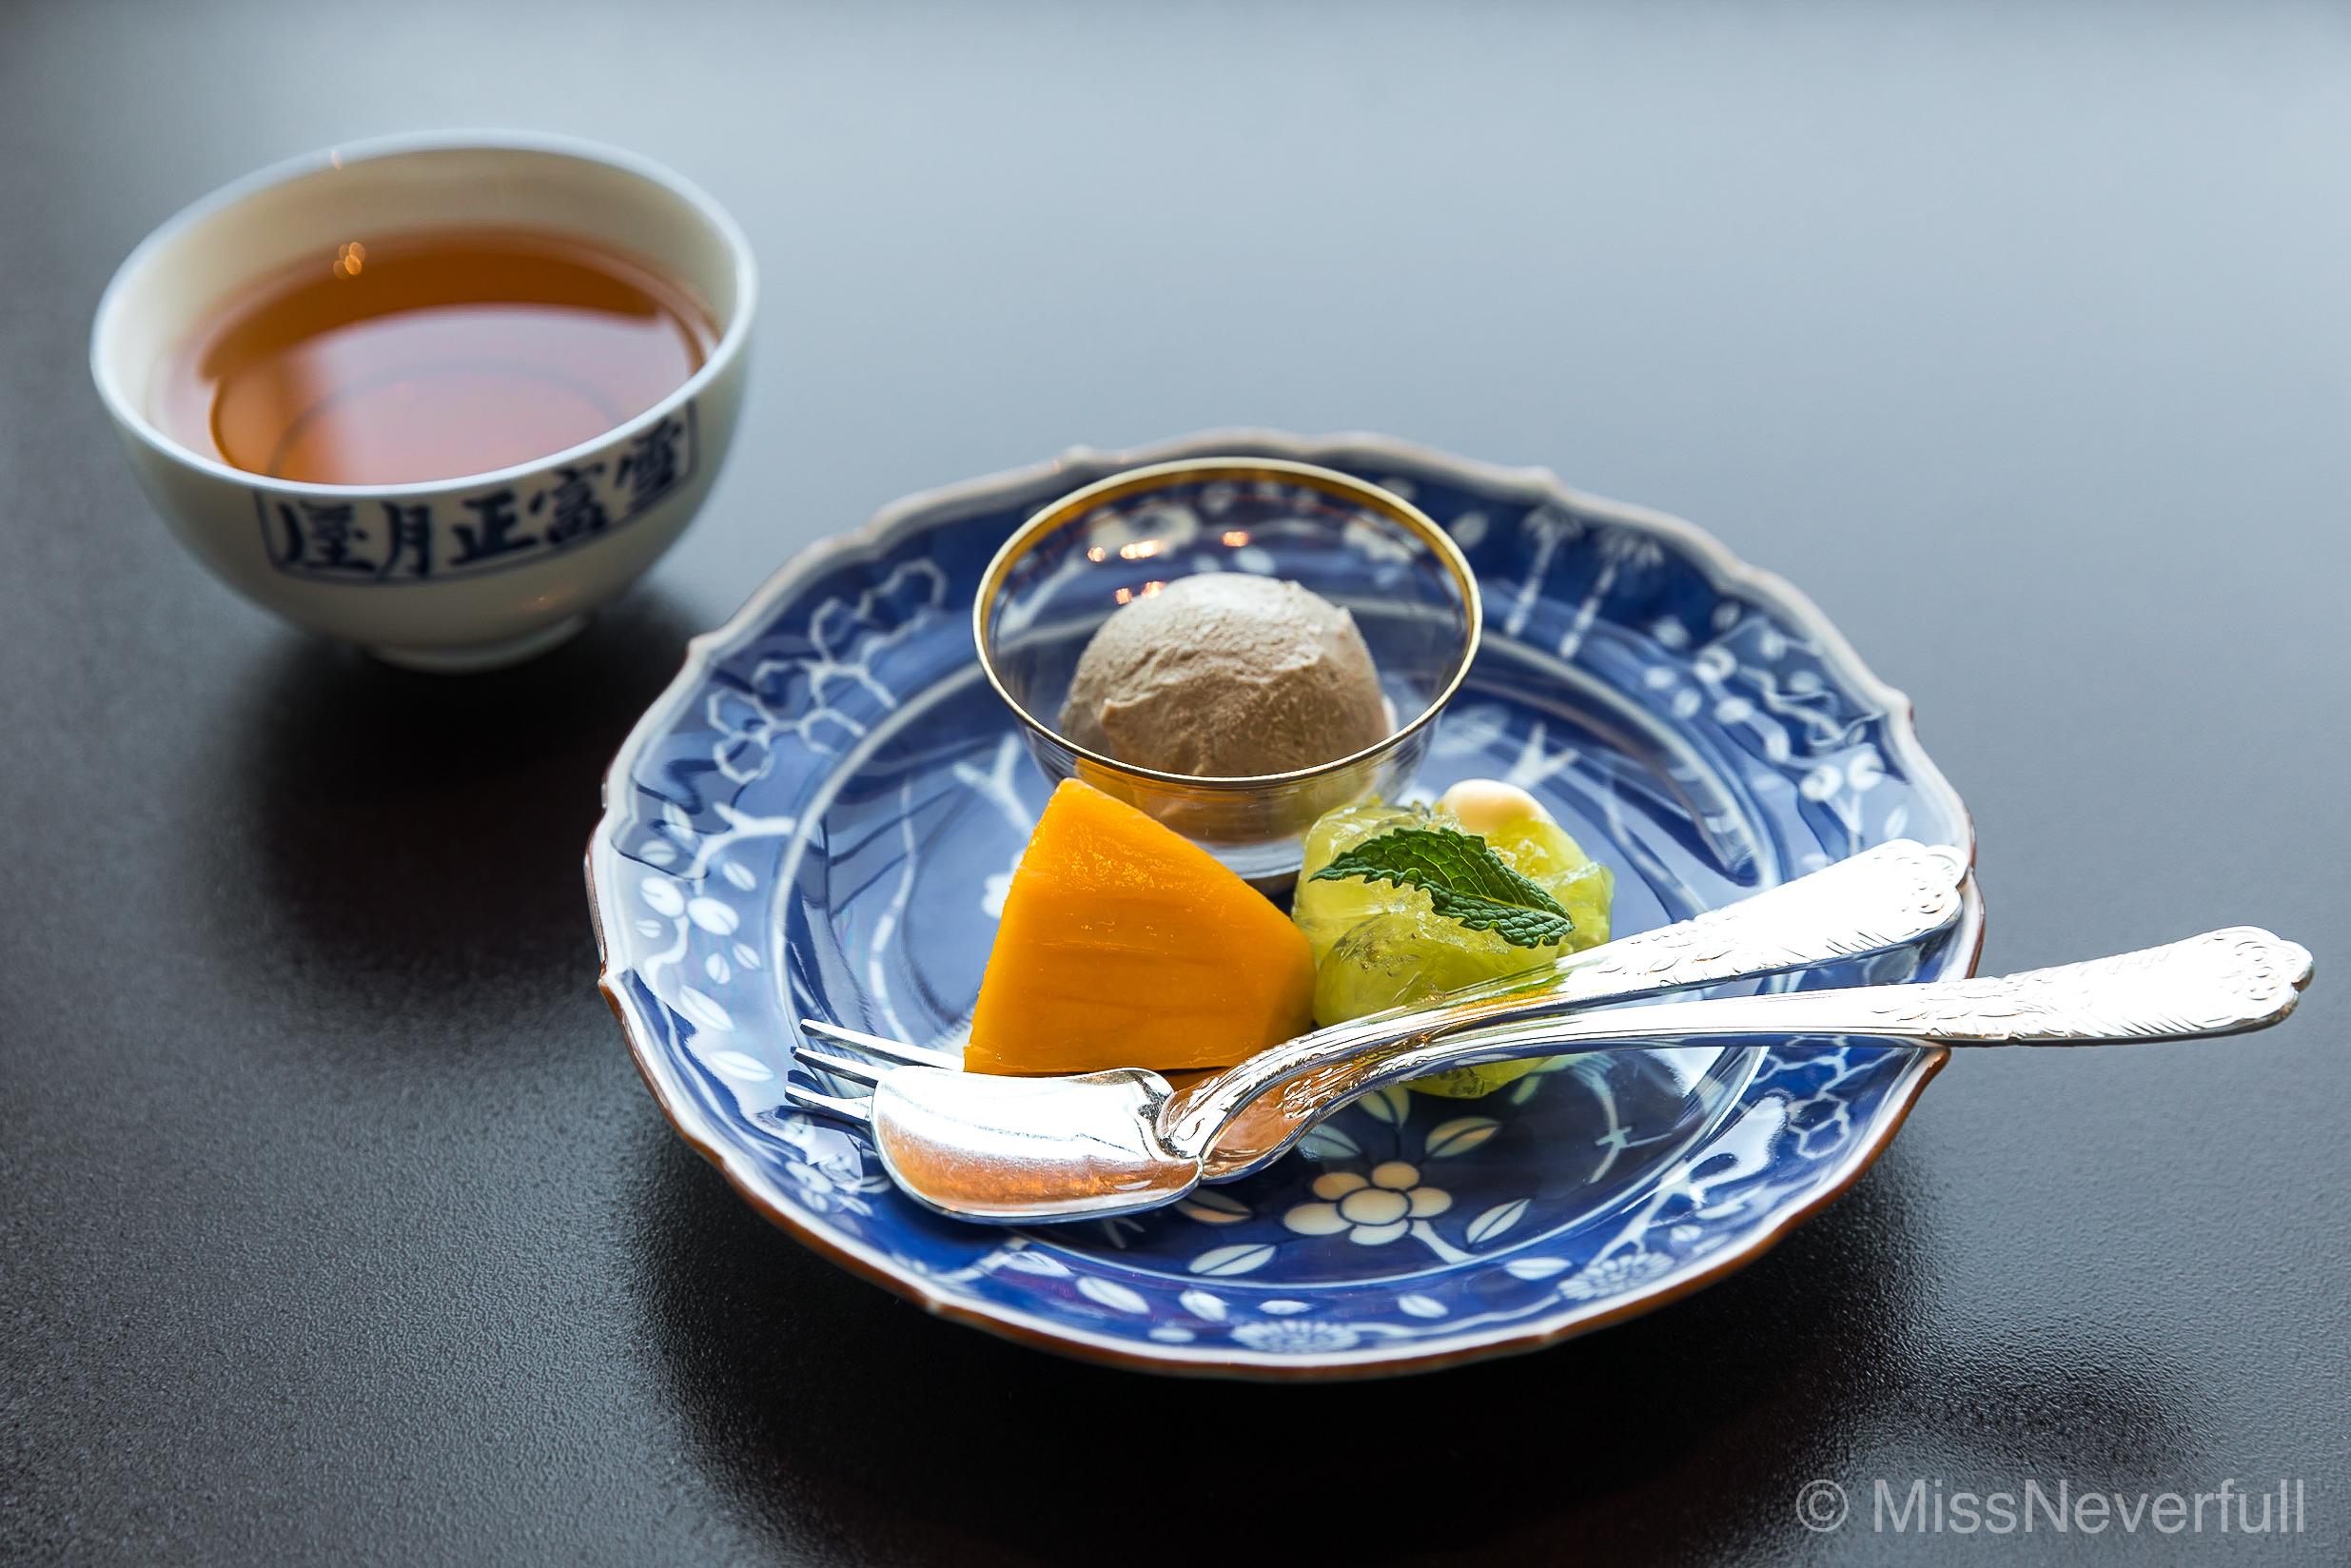 8. Desserts: 宮崎のマンゴー、静岡のメロン、ほじ茶アイス | Mango from Miyazaki, Melon from Shizuoka, Hojicha ice-cream